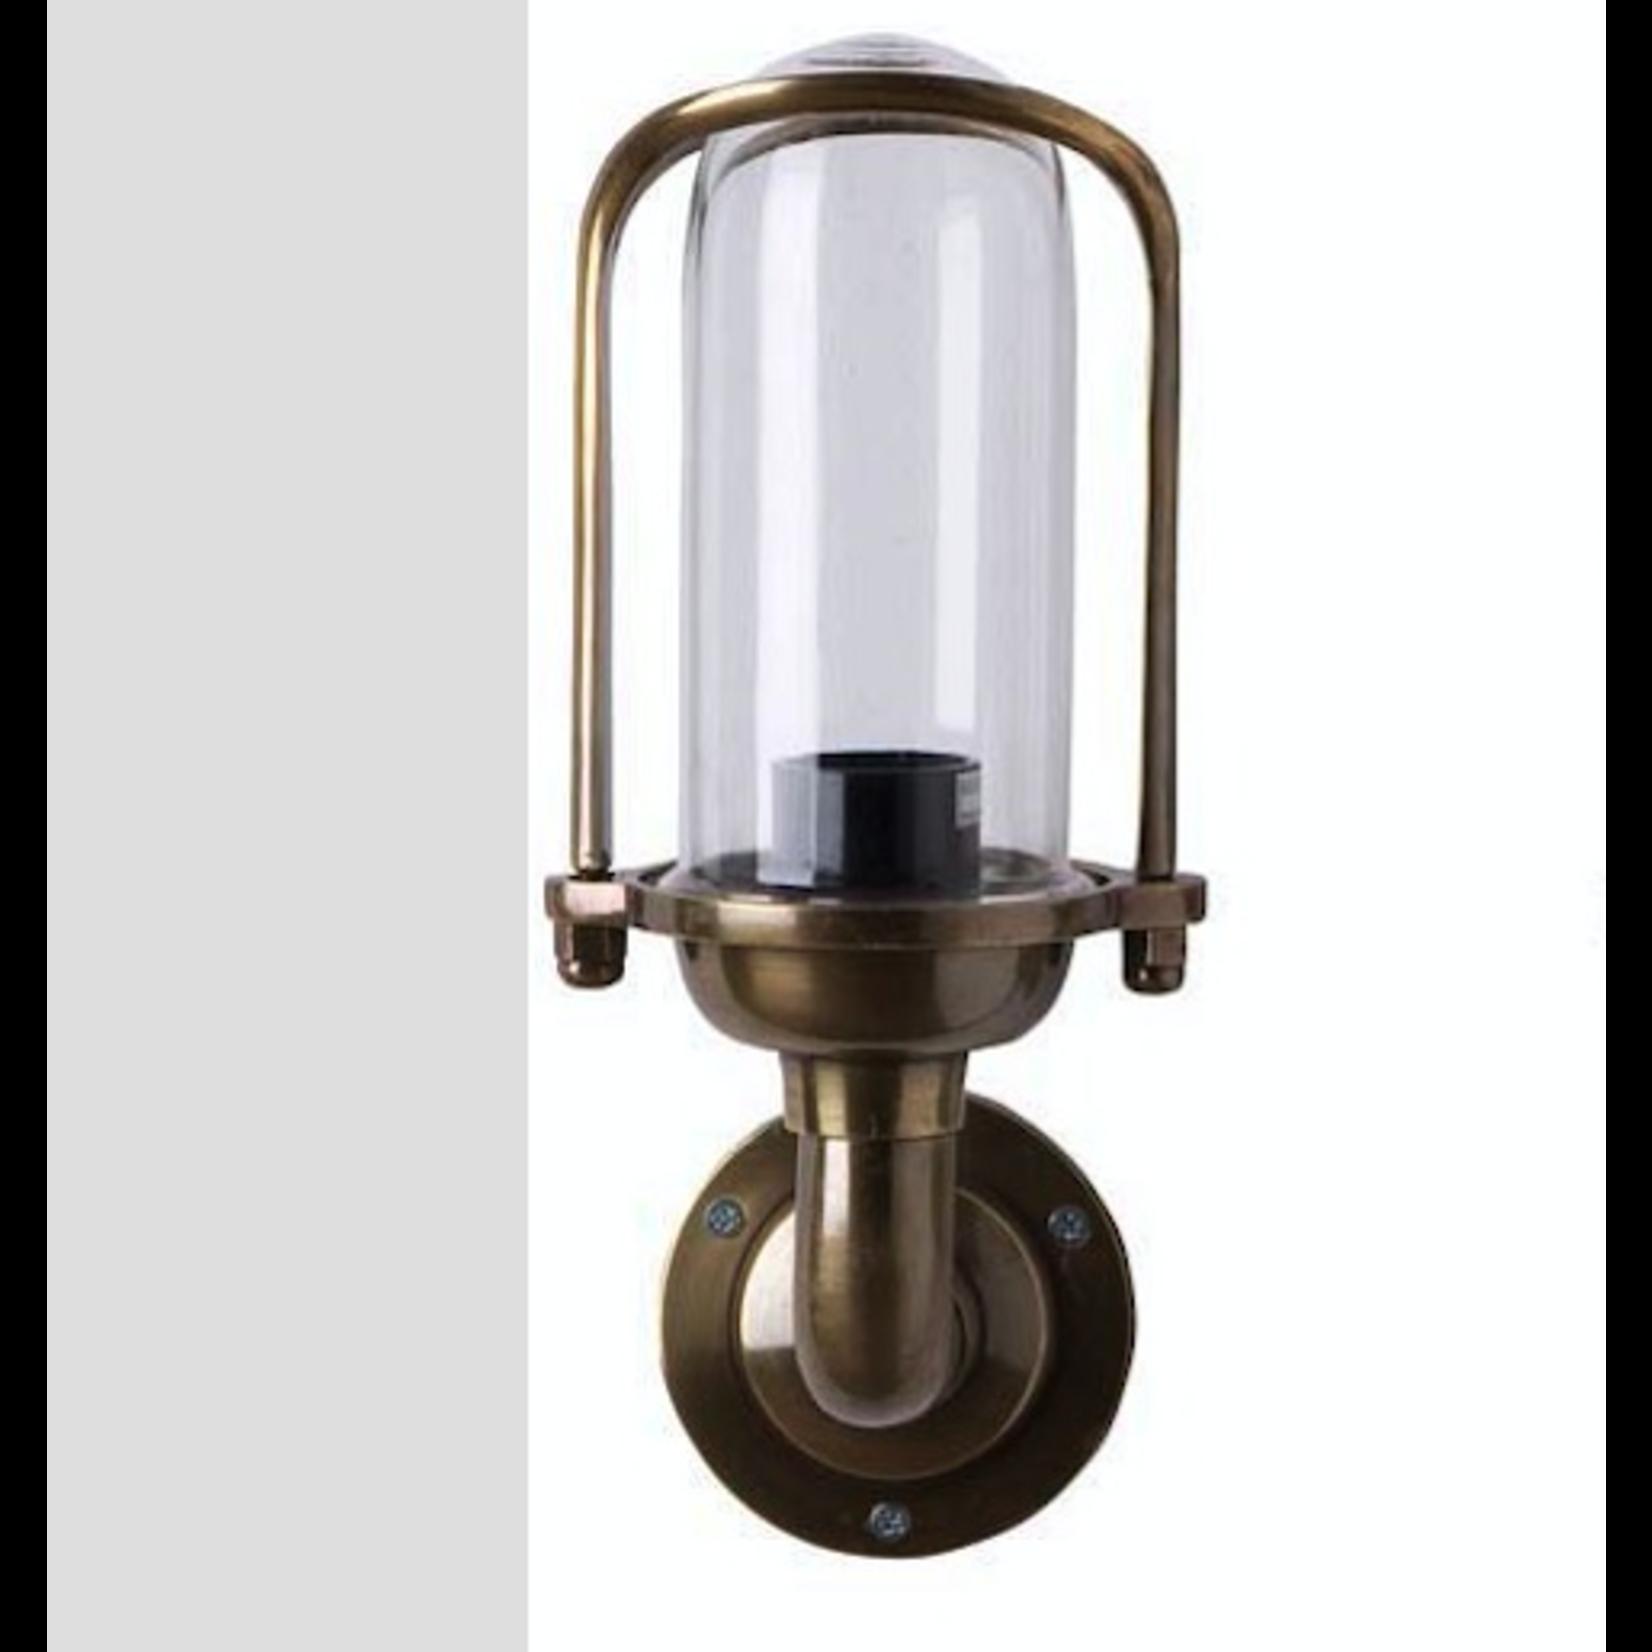 EICHHOLTZ LAMP WALL WOLSELEY BRASS